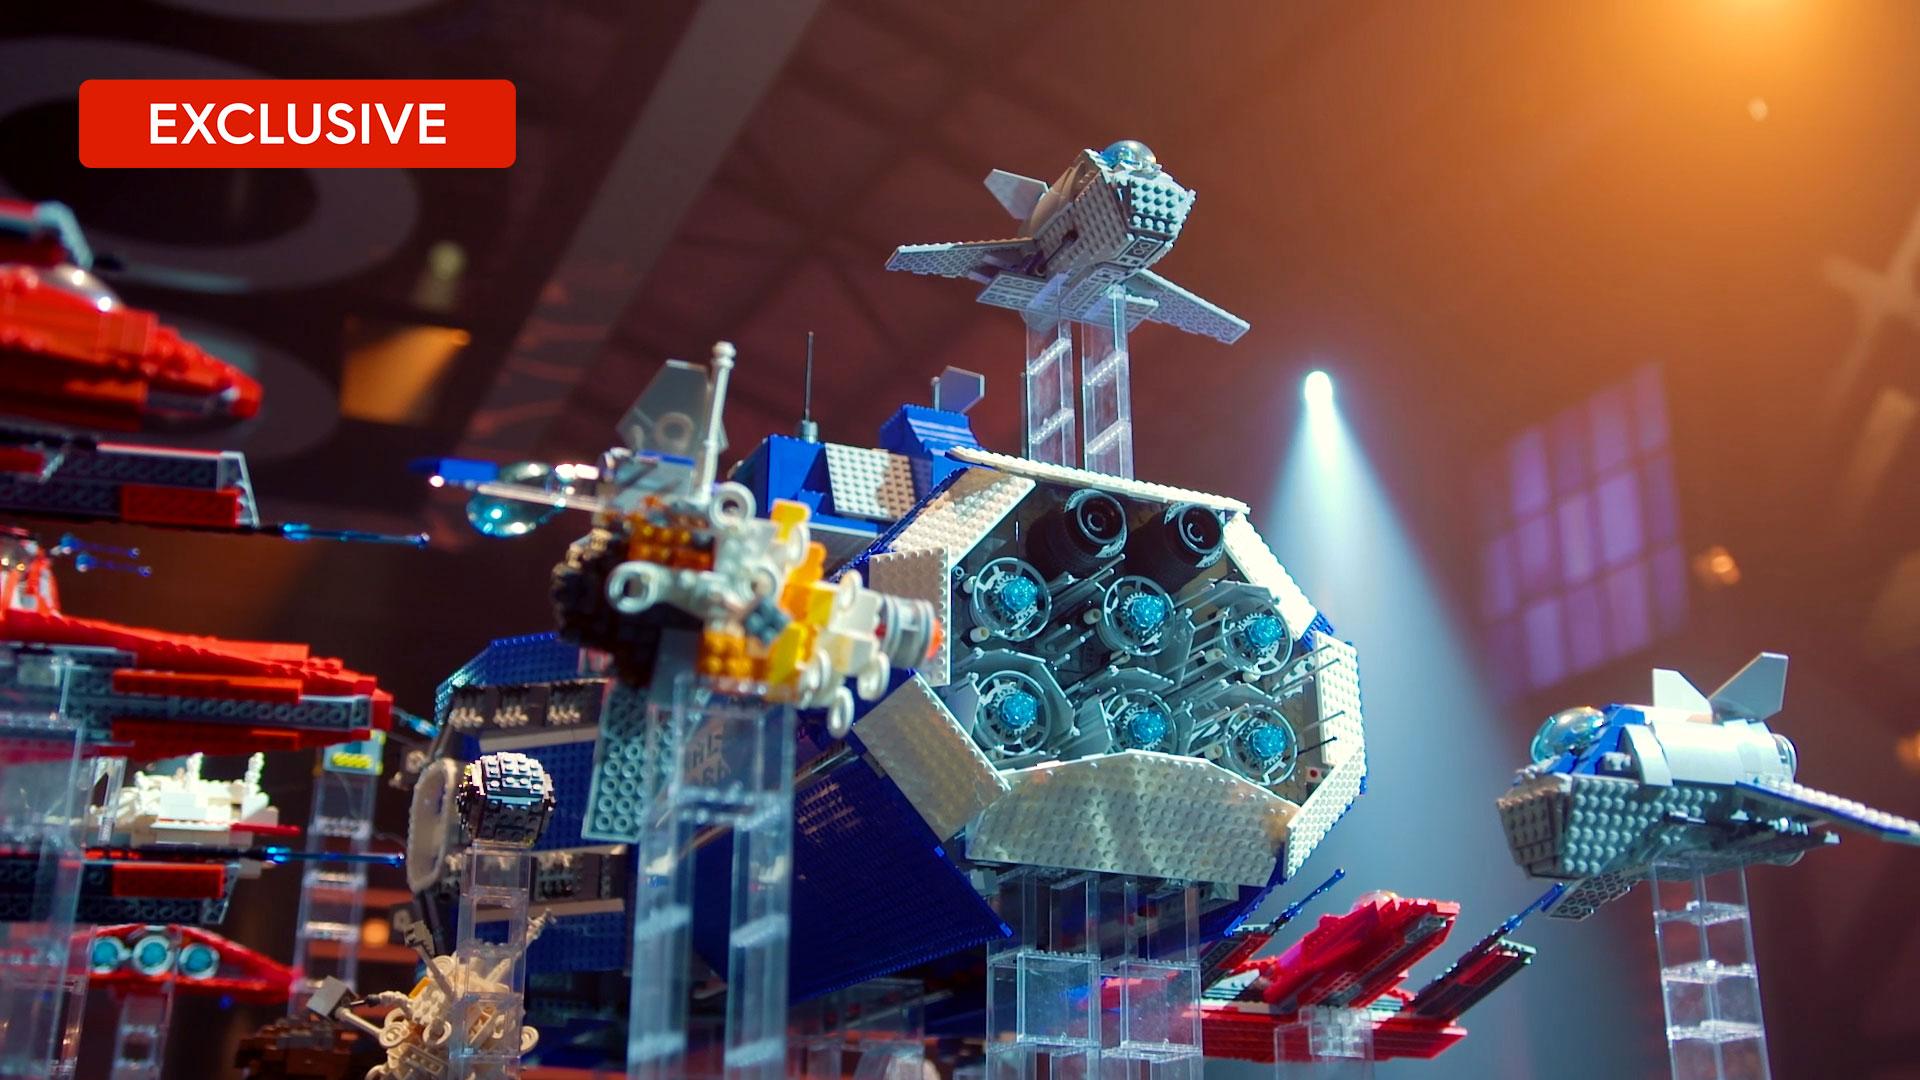 LEGO speed build: Jordan and Miller's spaceship